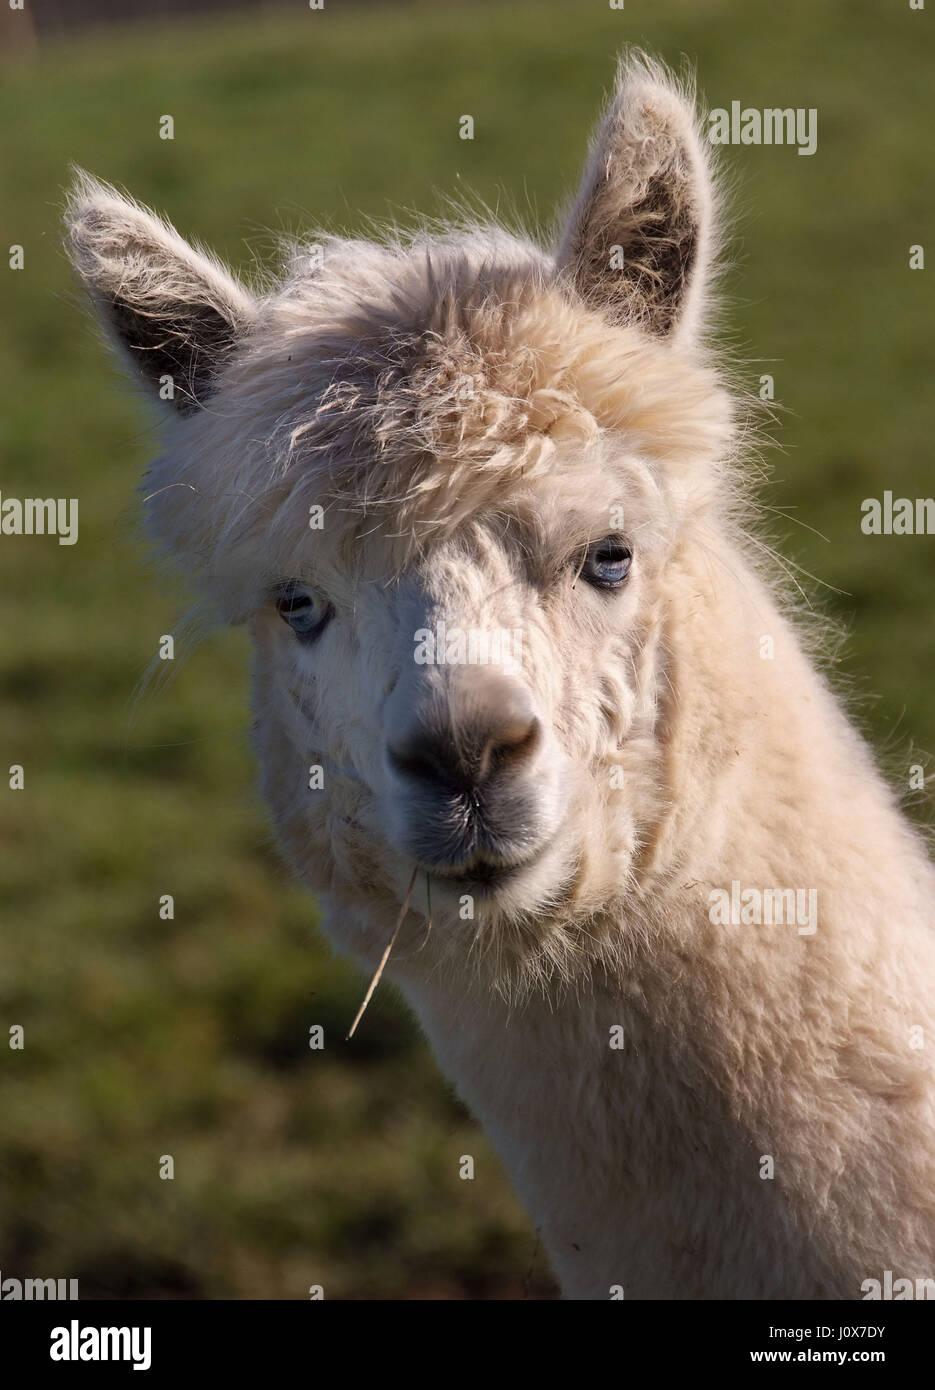 Domesticated Alpacas at their farm in Devon. - Stock Image